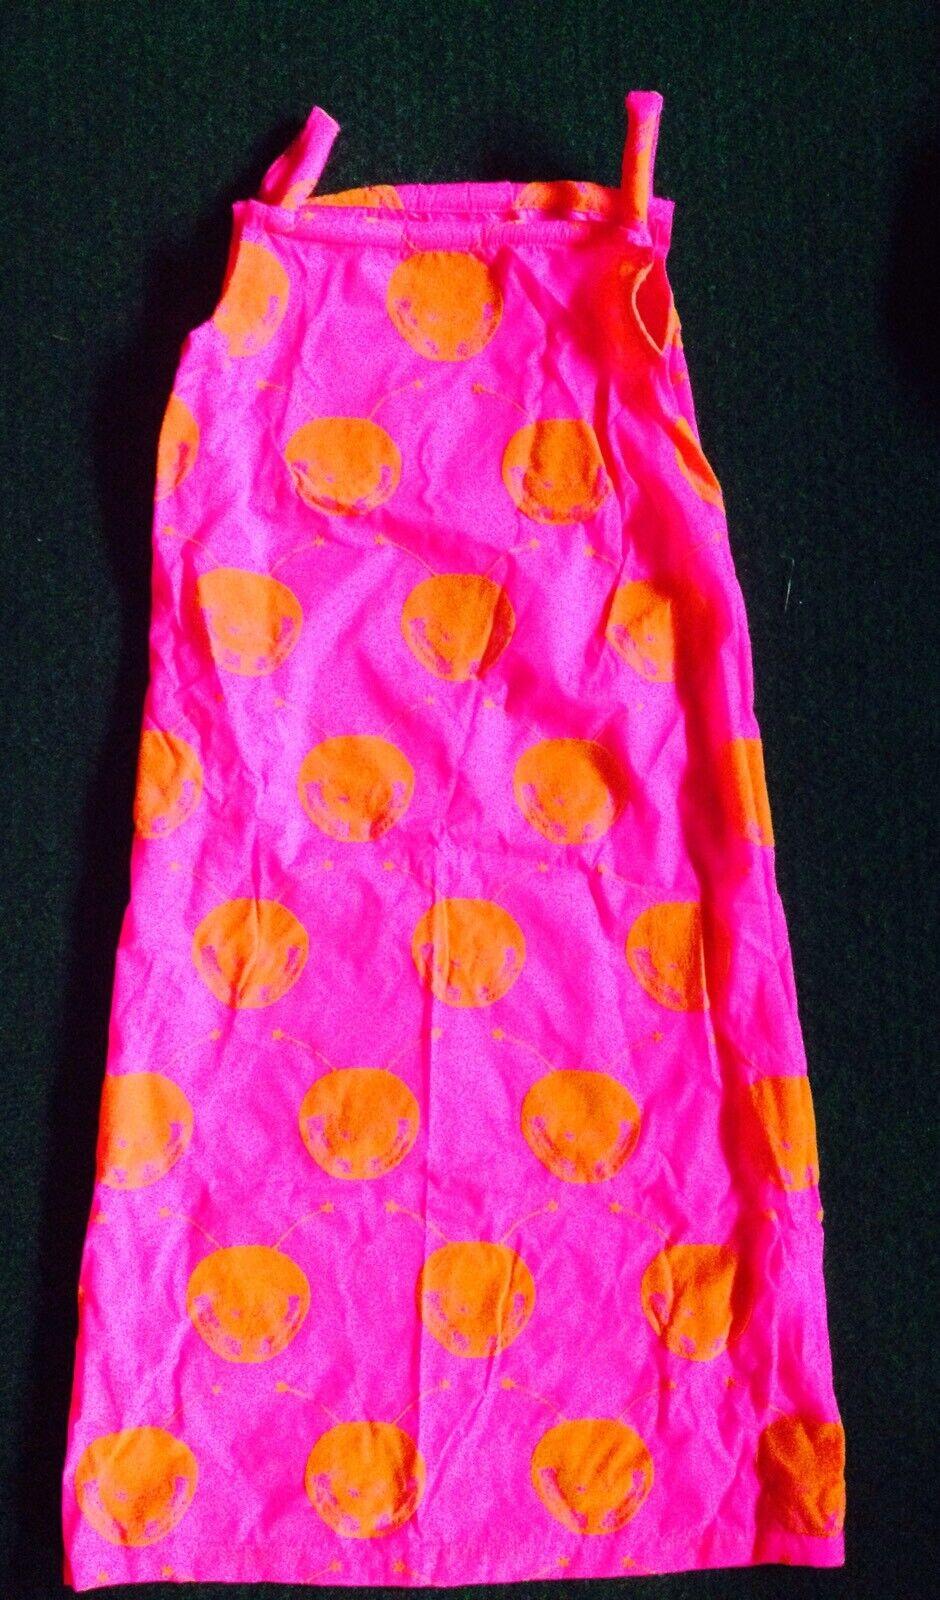 W< UV Neon Rave Festival Kleid 1995-1999